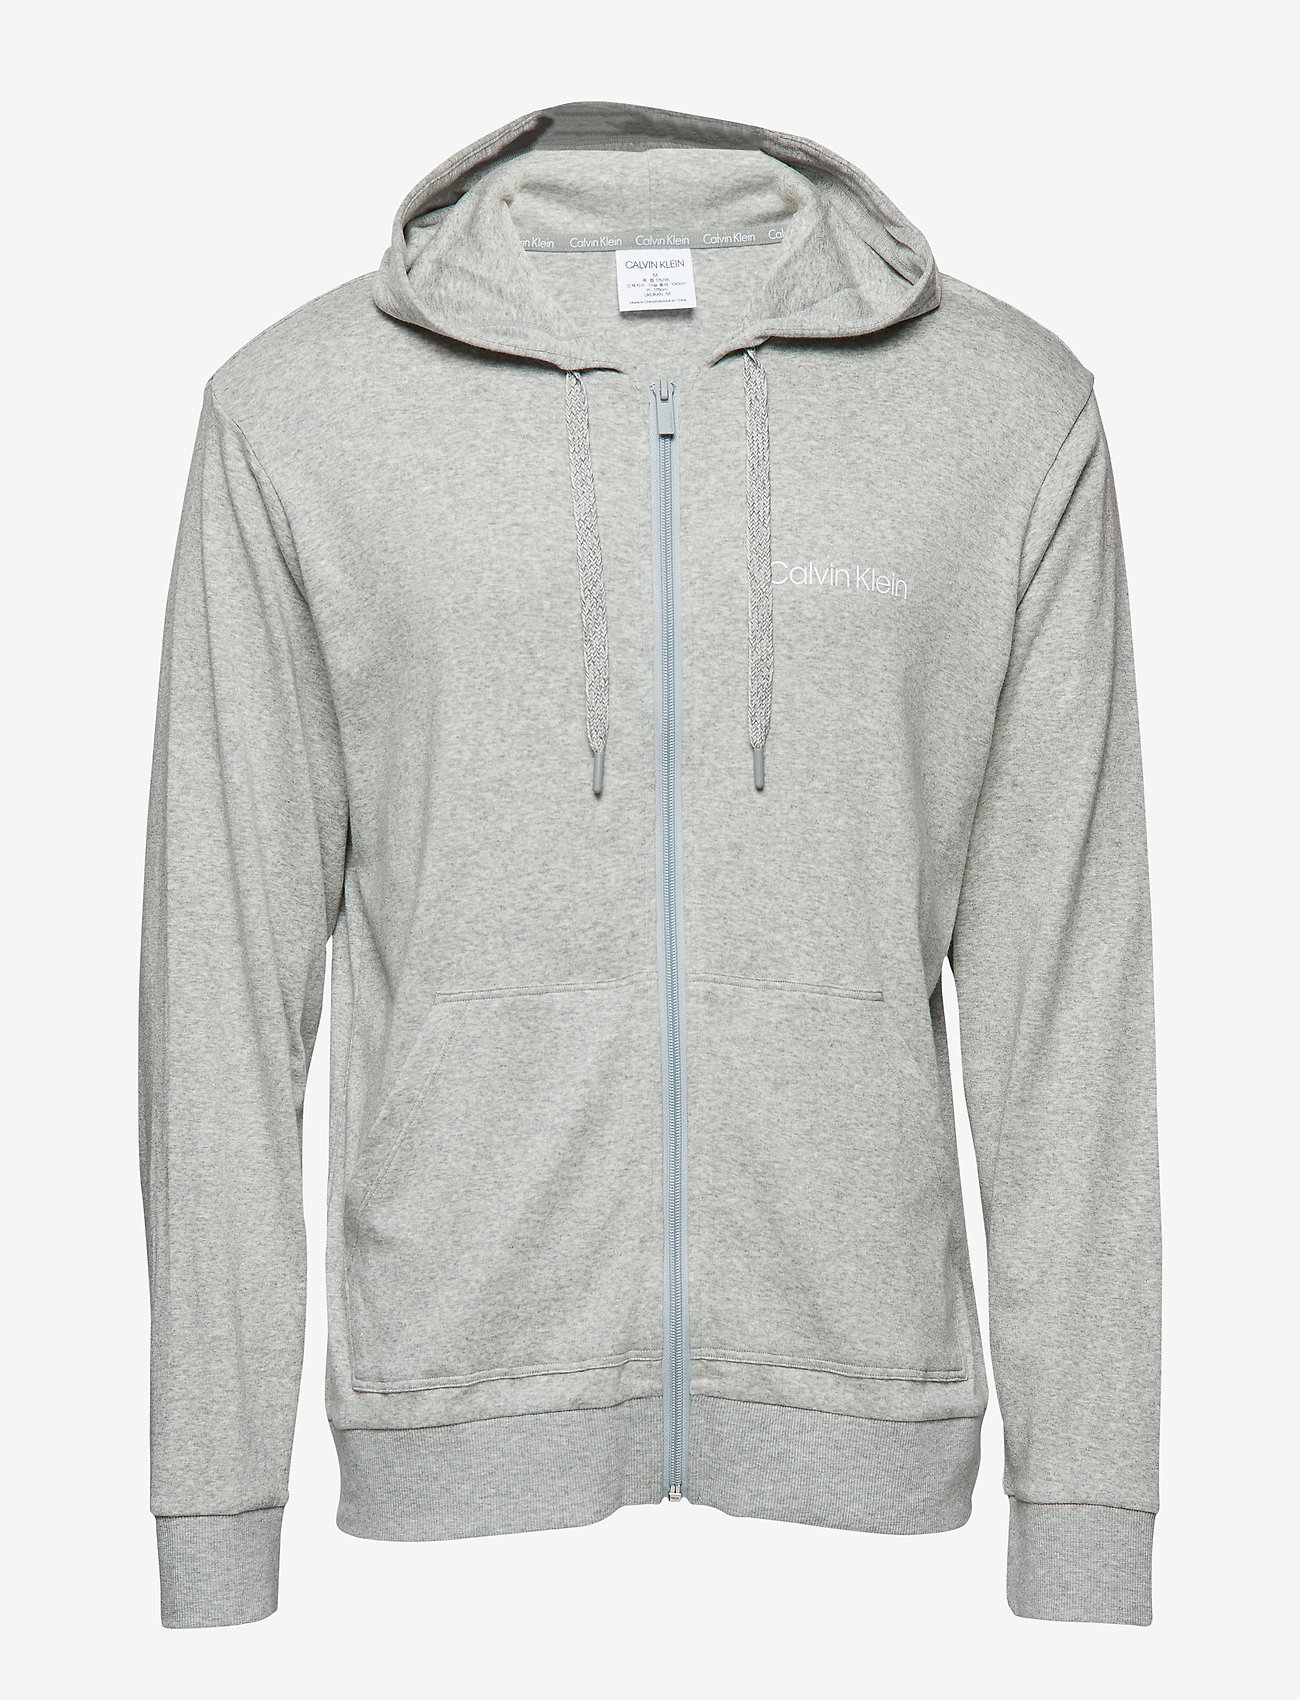 Calvin Klein - FULL ZIP SWEATSHIRT - sweats à capuche - grey heather - 0